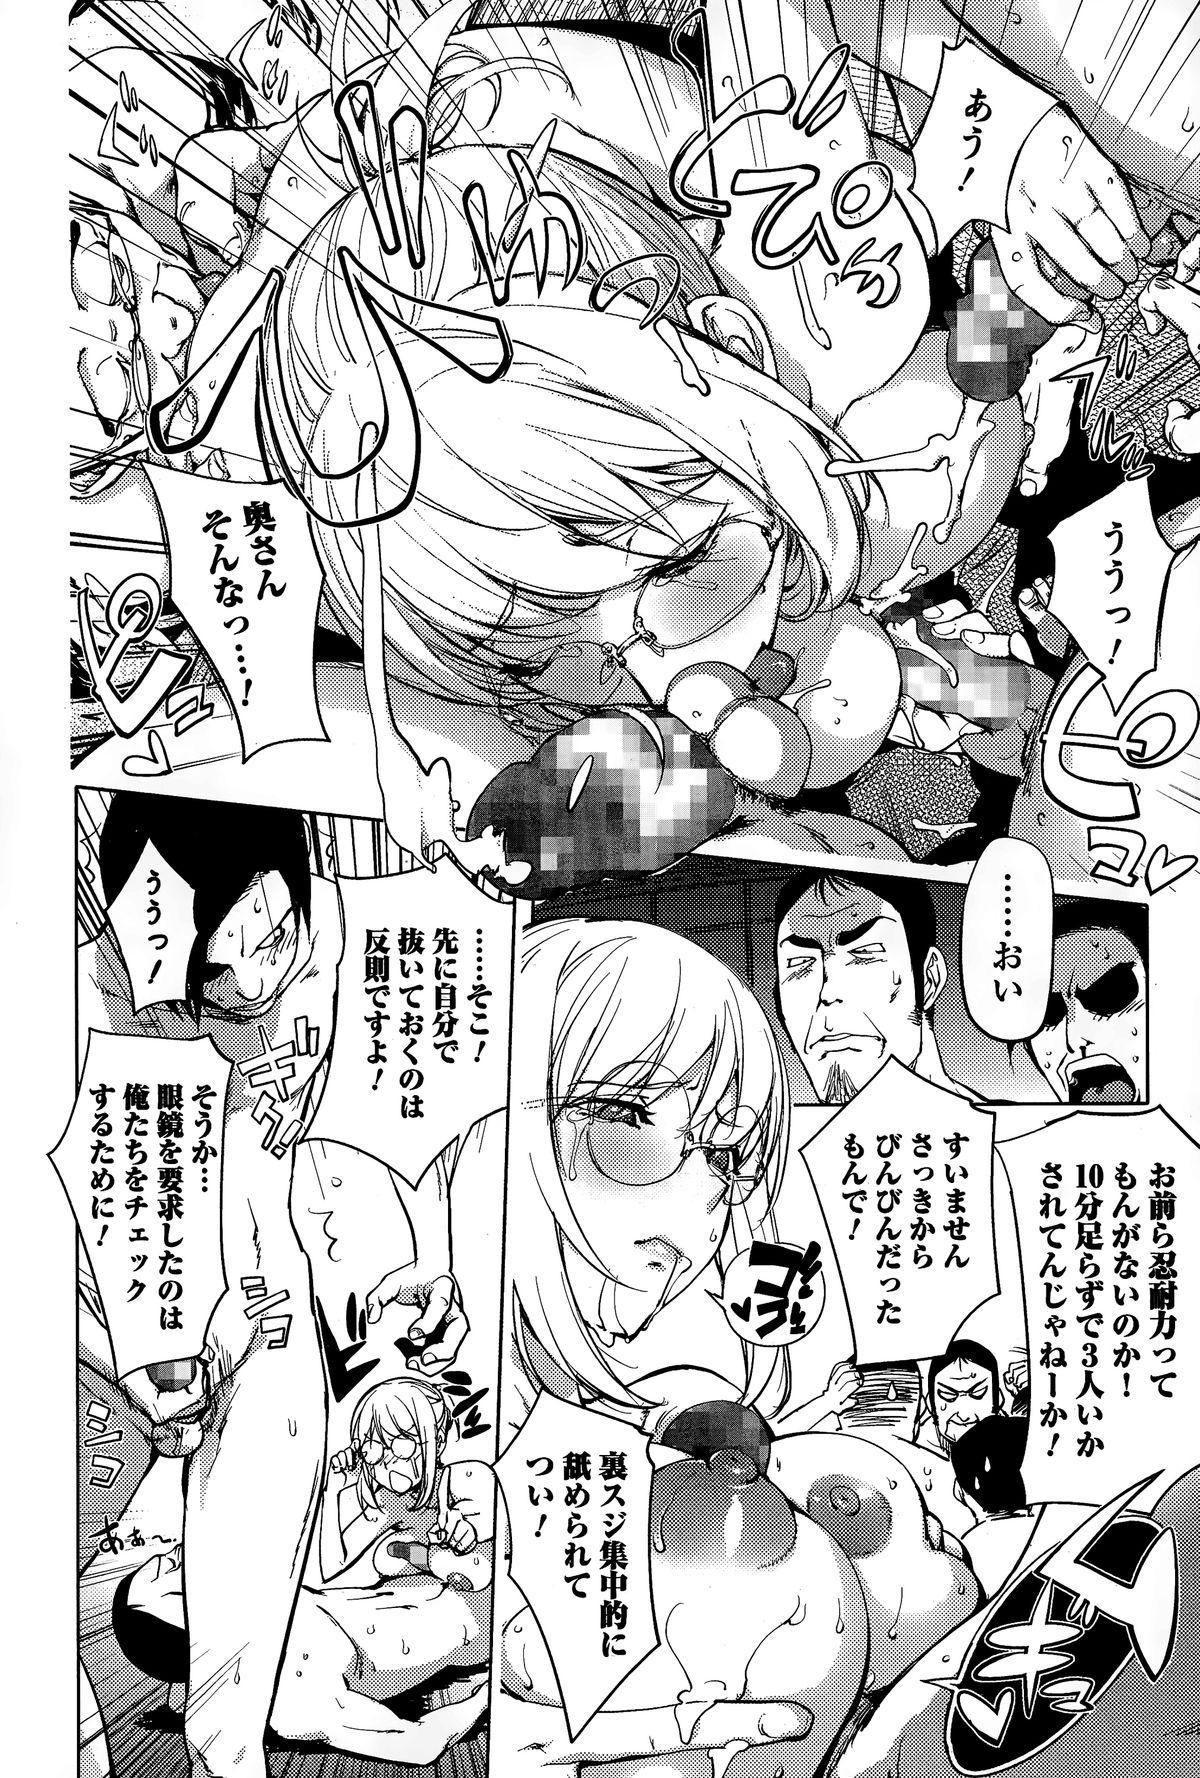 Comic Toutetsu 2015-02 Vol. 3 91